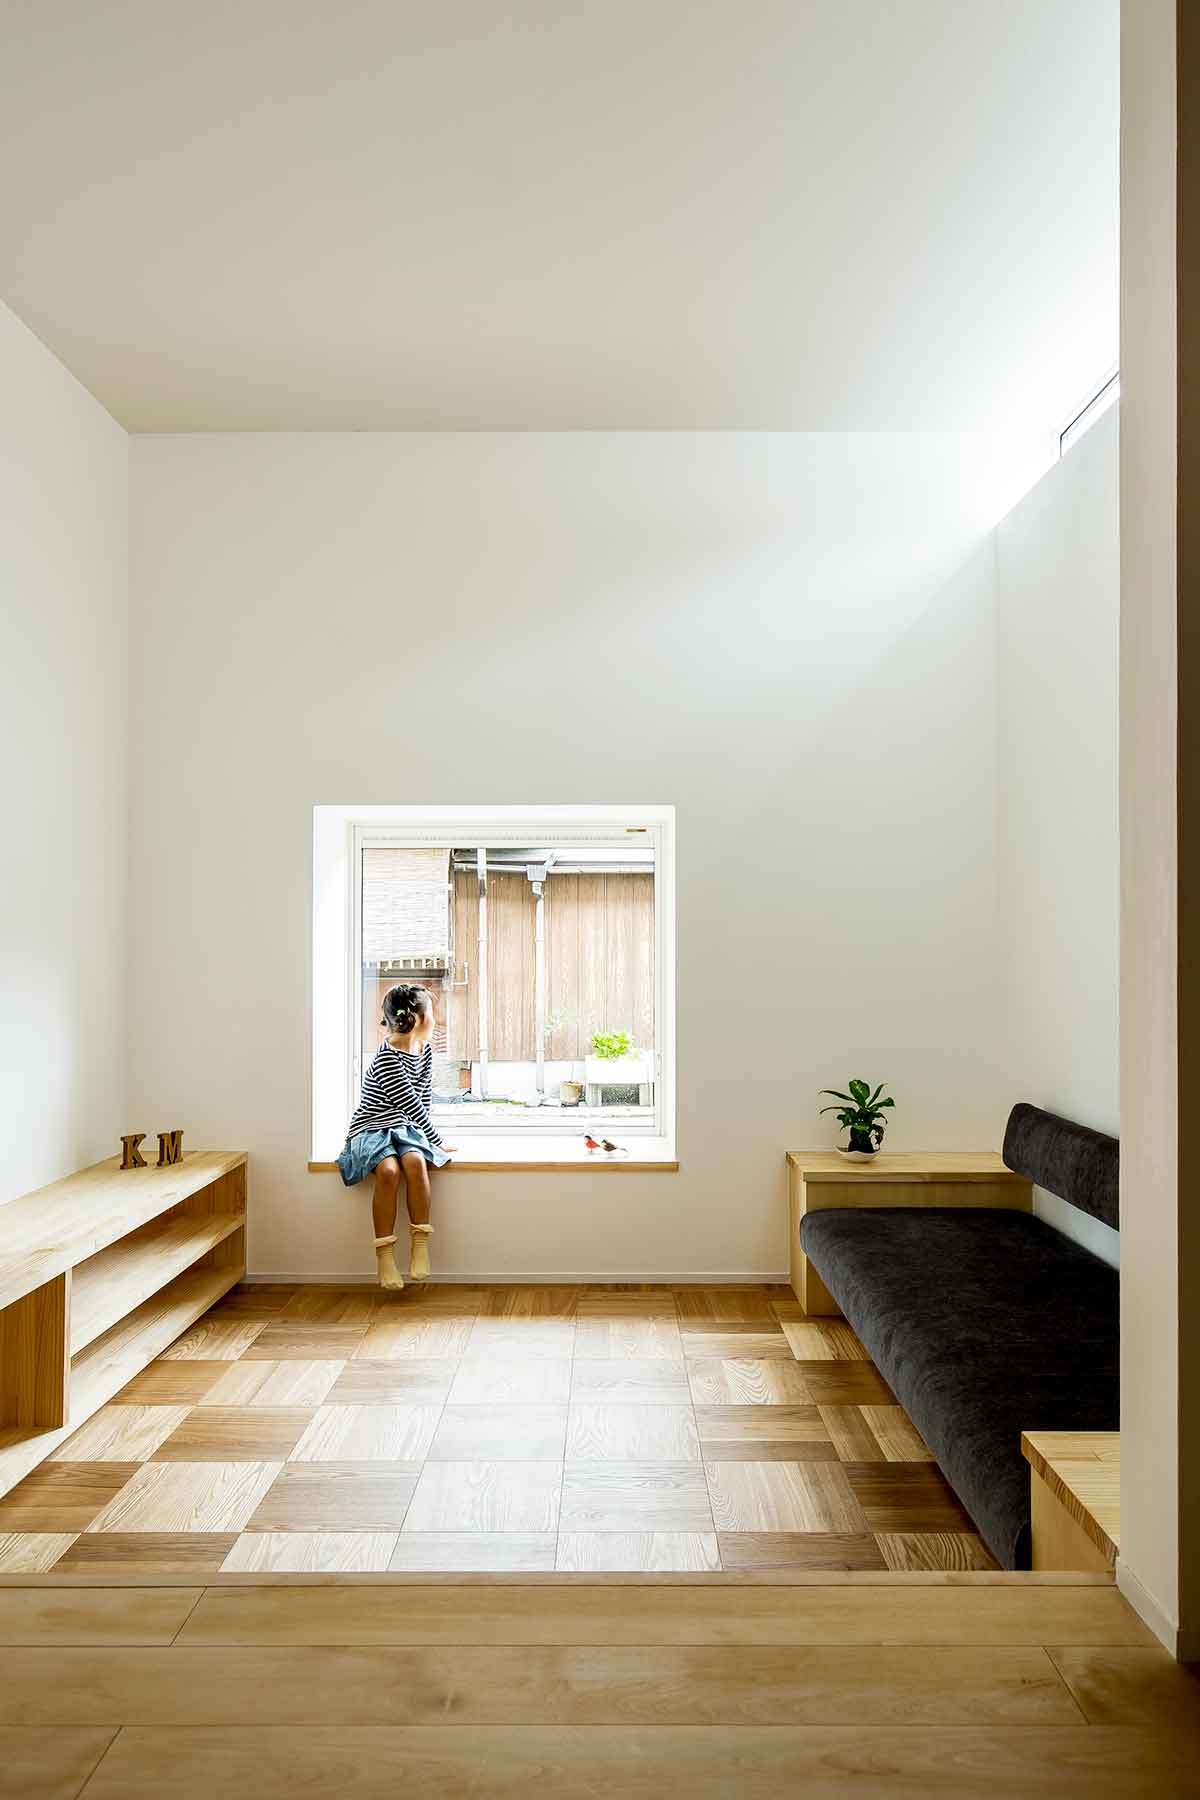 Architecture-by-Hearth-Architects,-Japan.--Photography-by-Yuta-Yamada-03.jpg